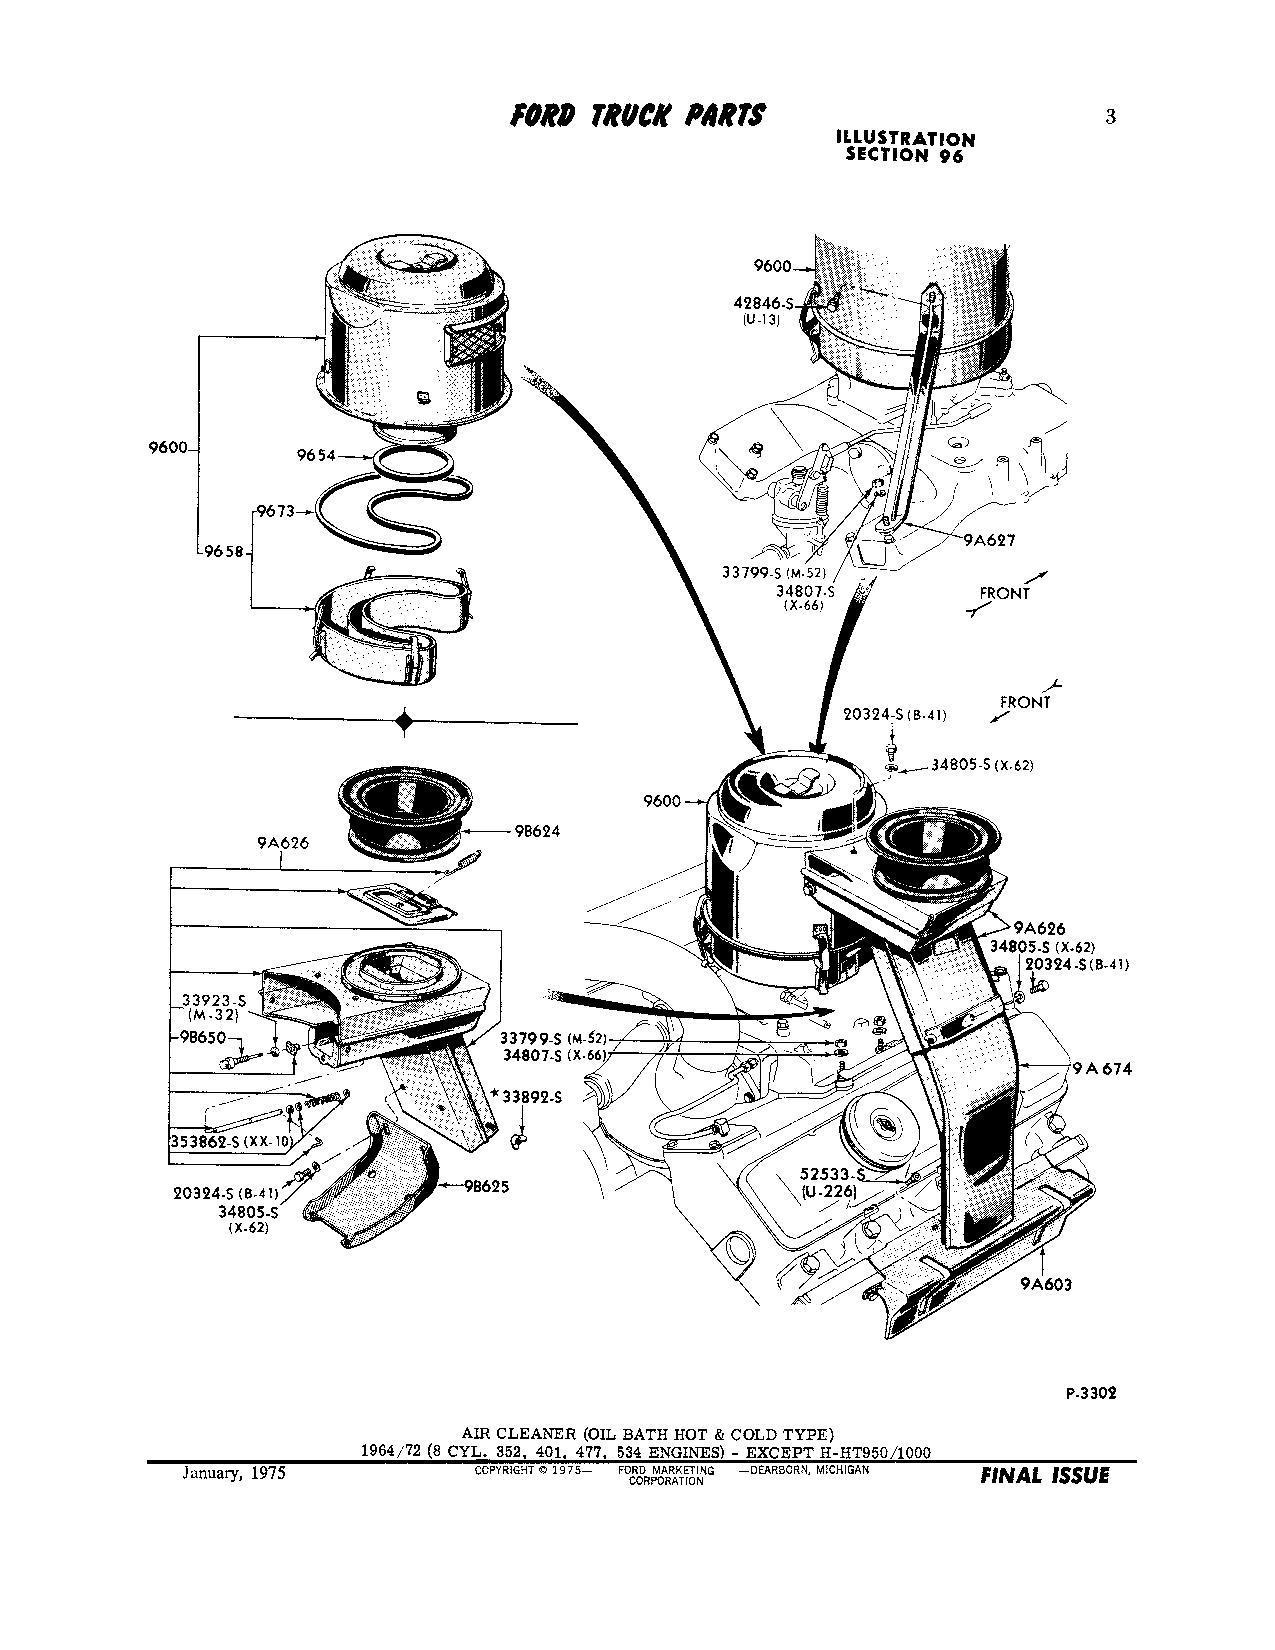 1964 ford f850 534 v8 parts